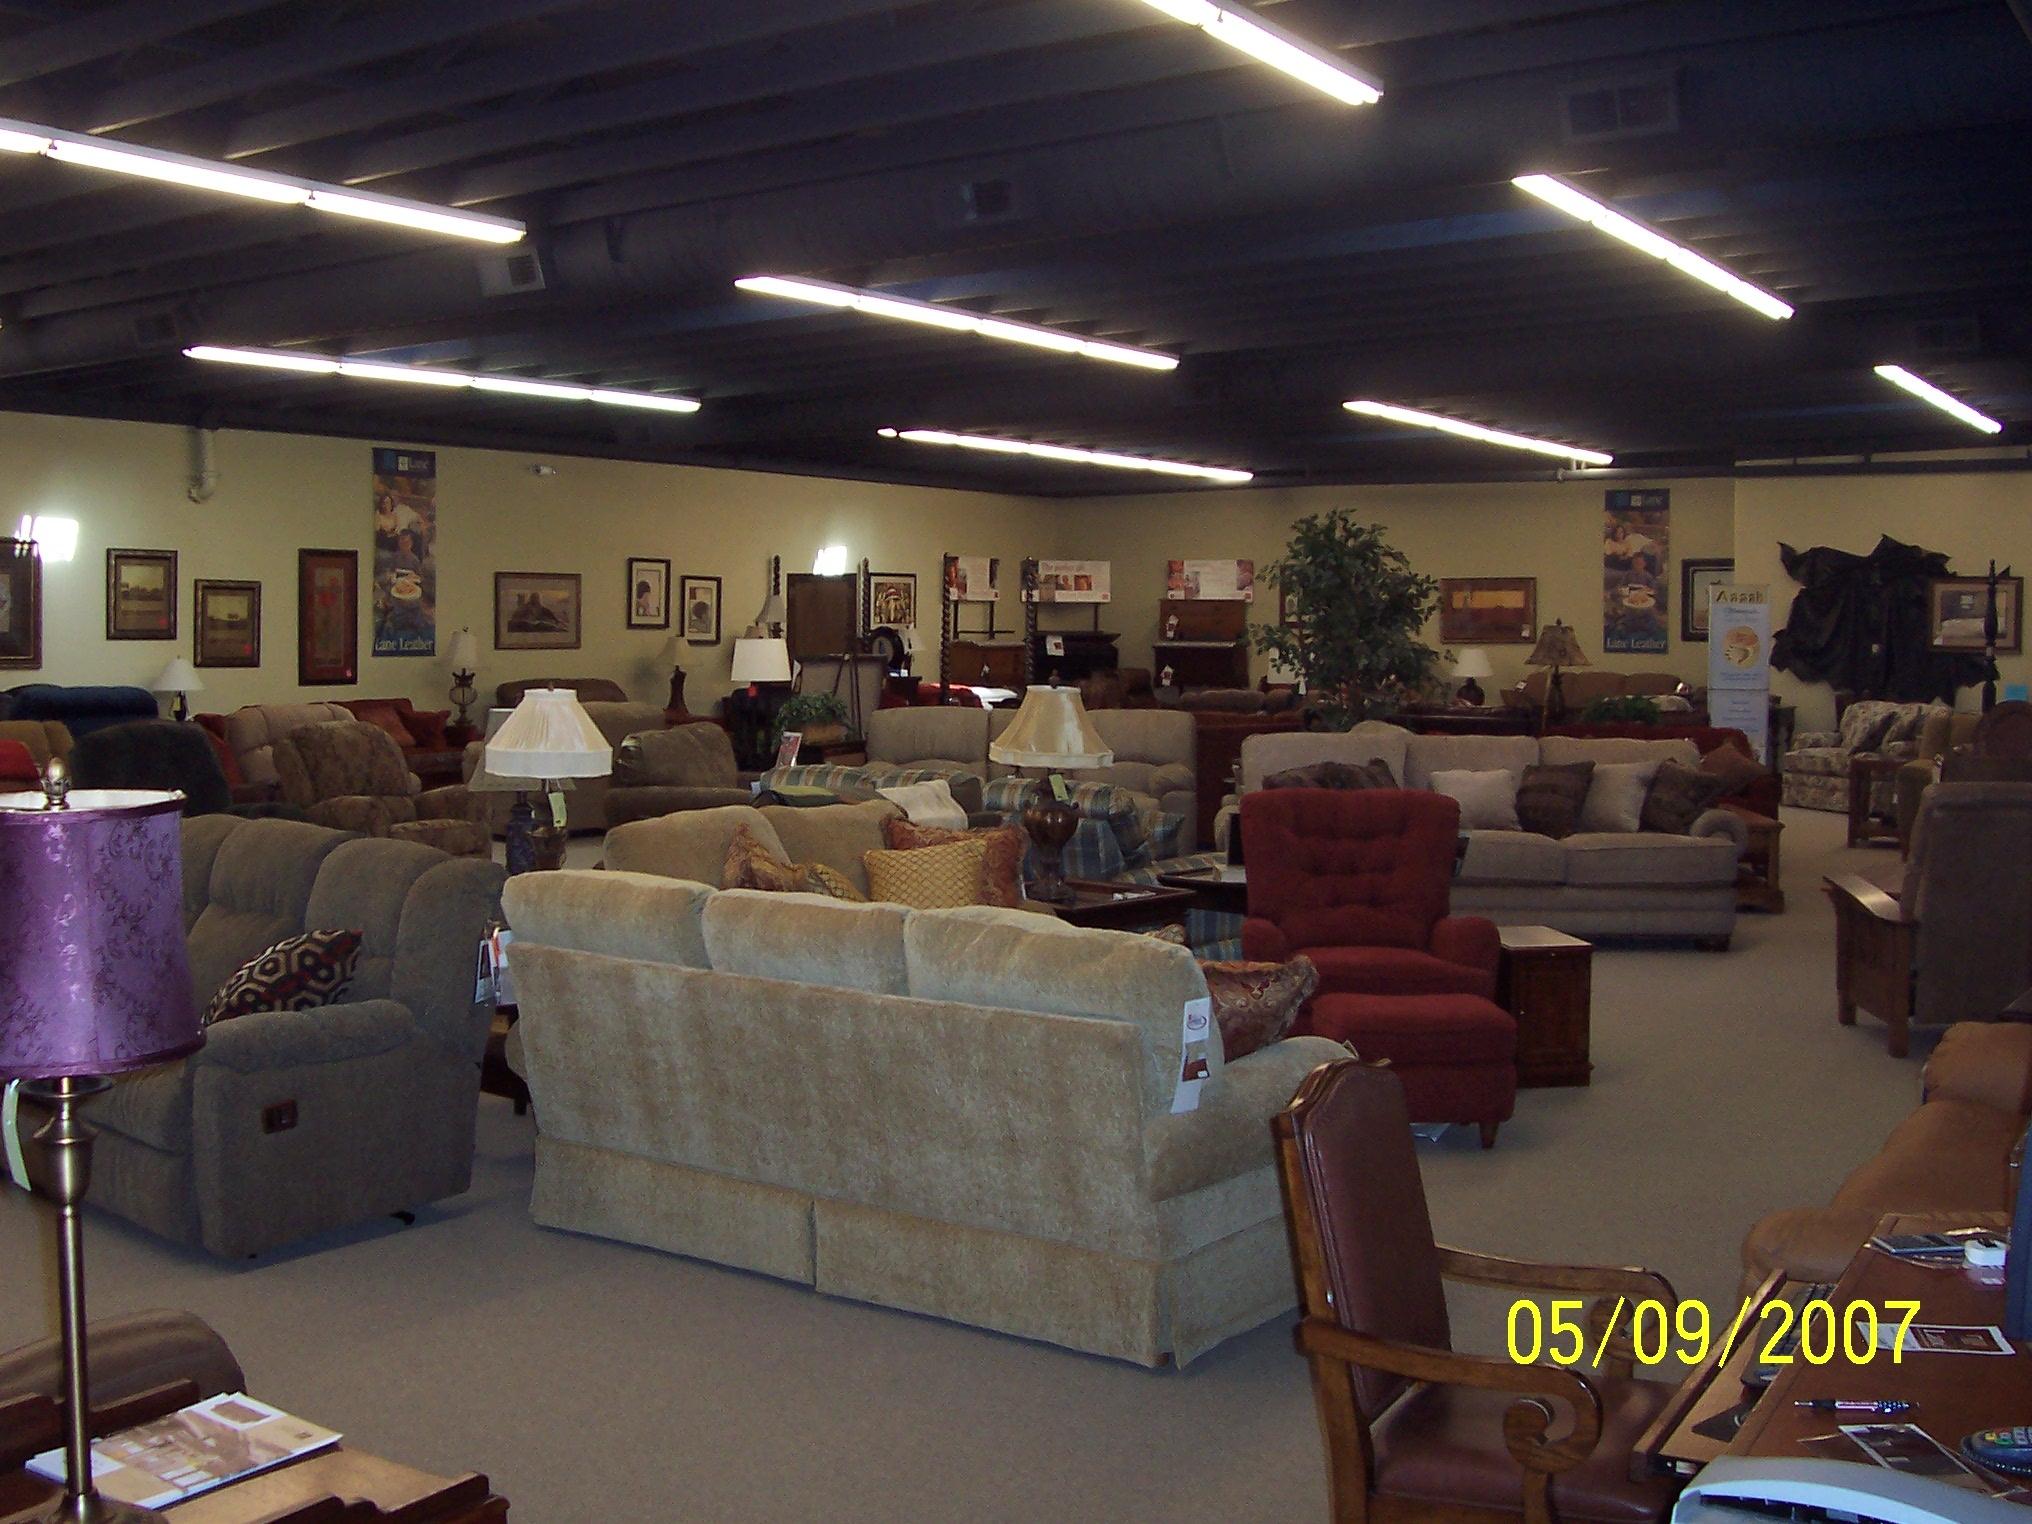 Cascade Furniture ShowroomSample Of Cascade Furnitureu0027s Showroom Floor.  Wholesale Furniture Brokers